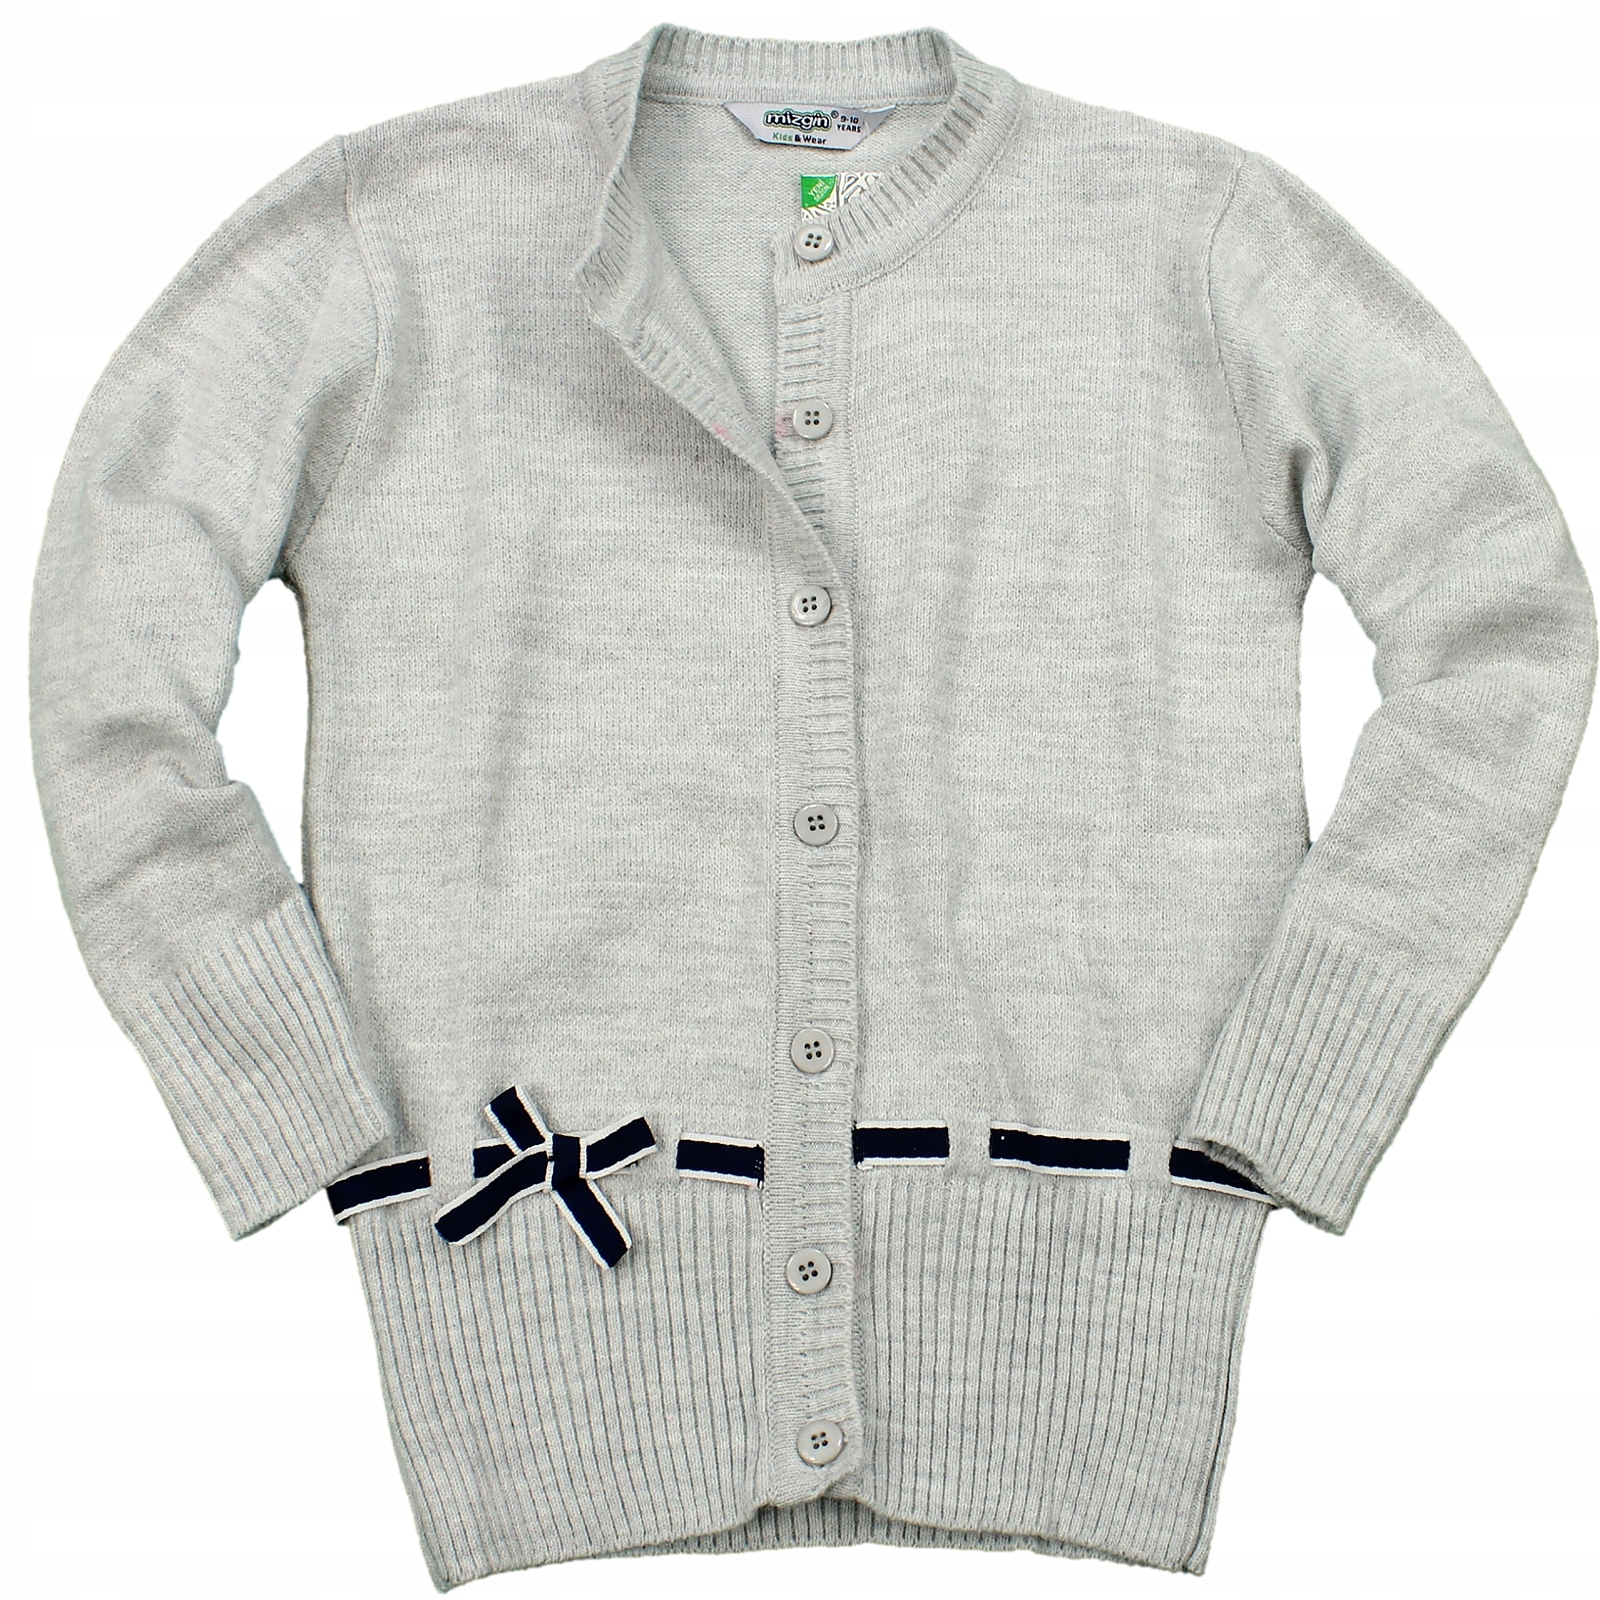 SVETER Cardigan jumper sveter SIVÁ 158/164 GH379